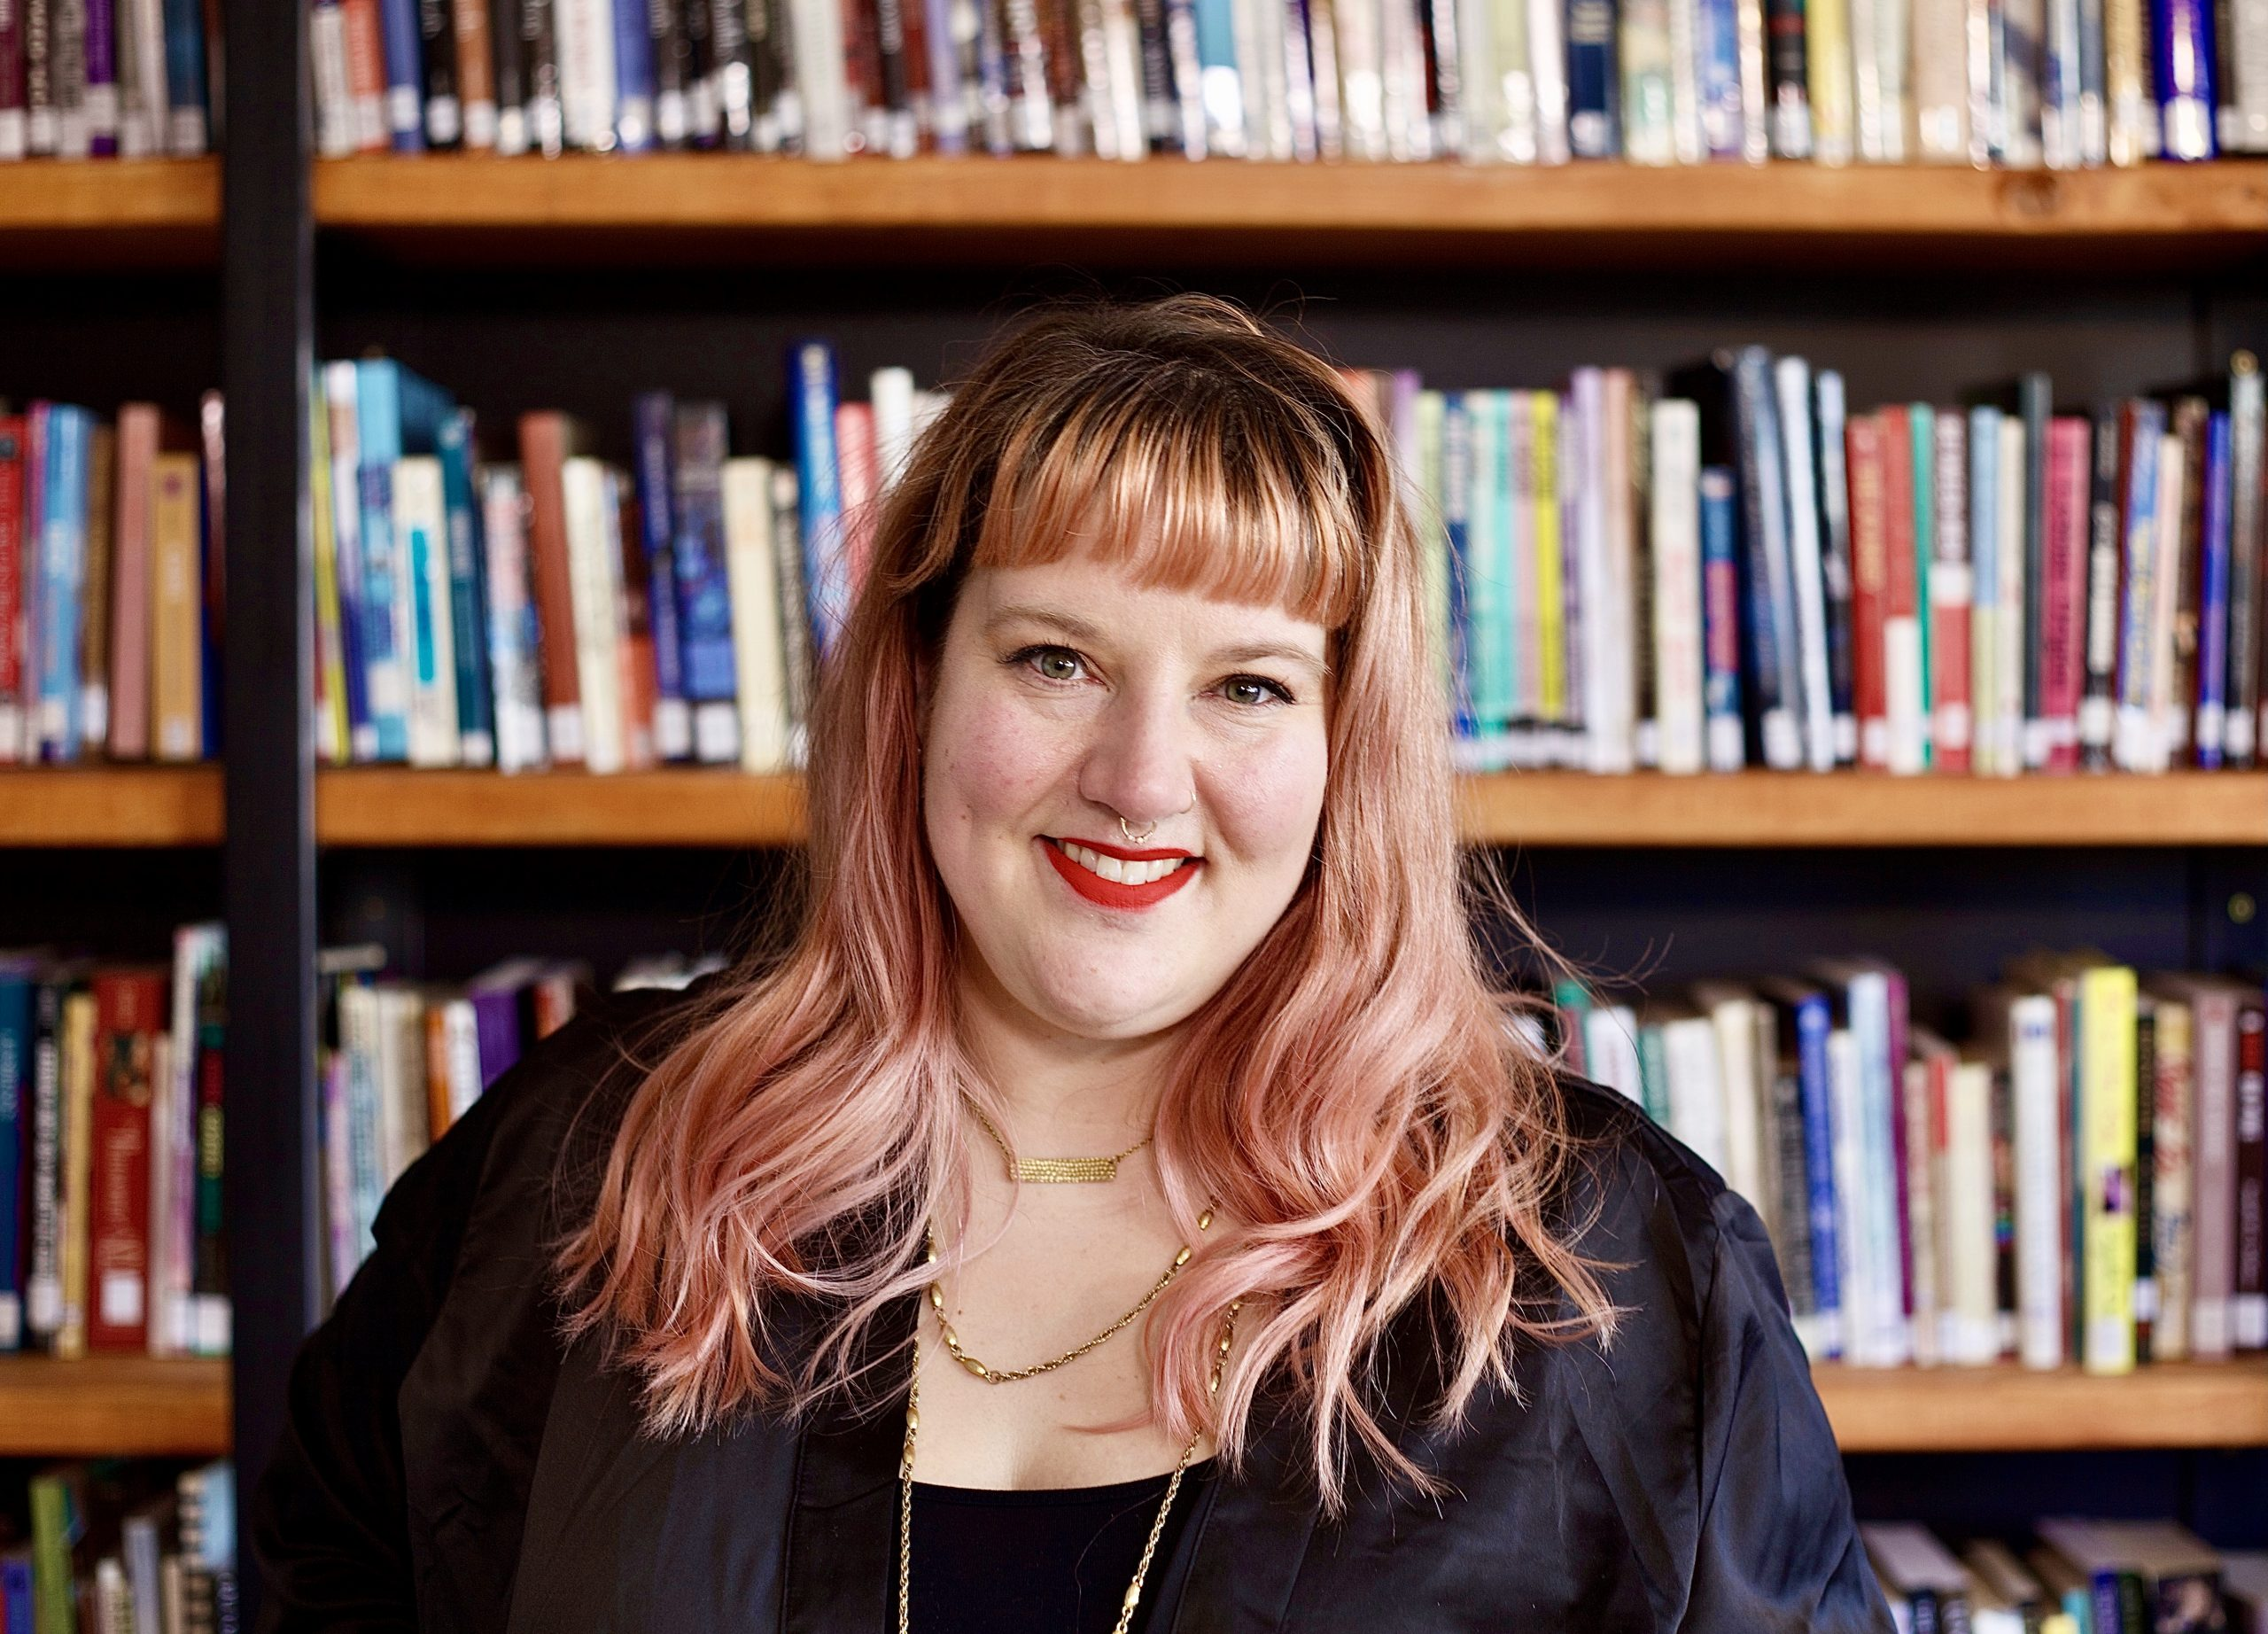 Heather Hale representative for Saskatoon Sexual Health, RBC KnockOUT award recipient